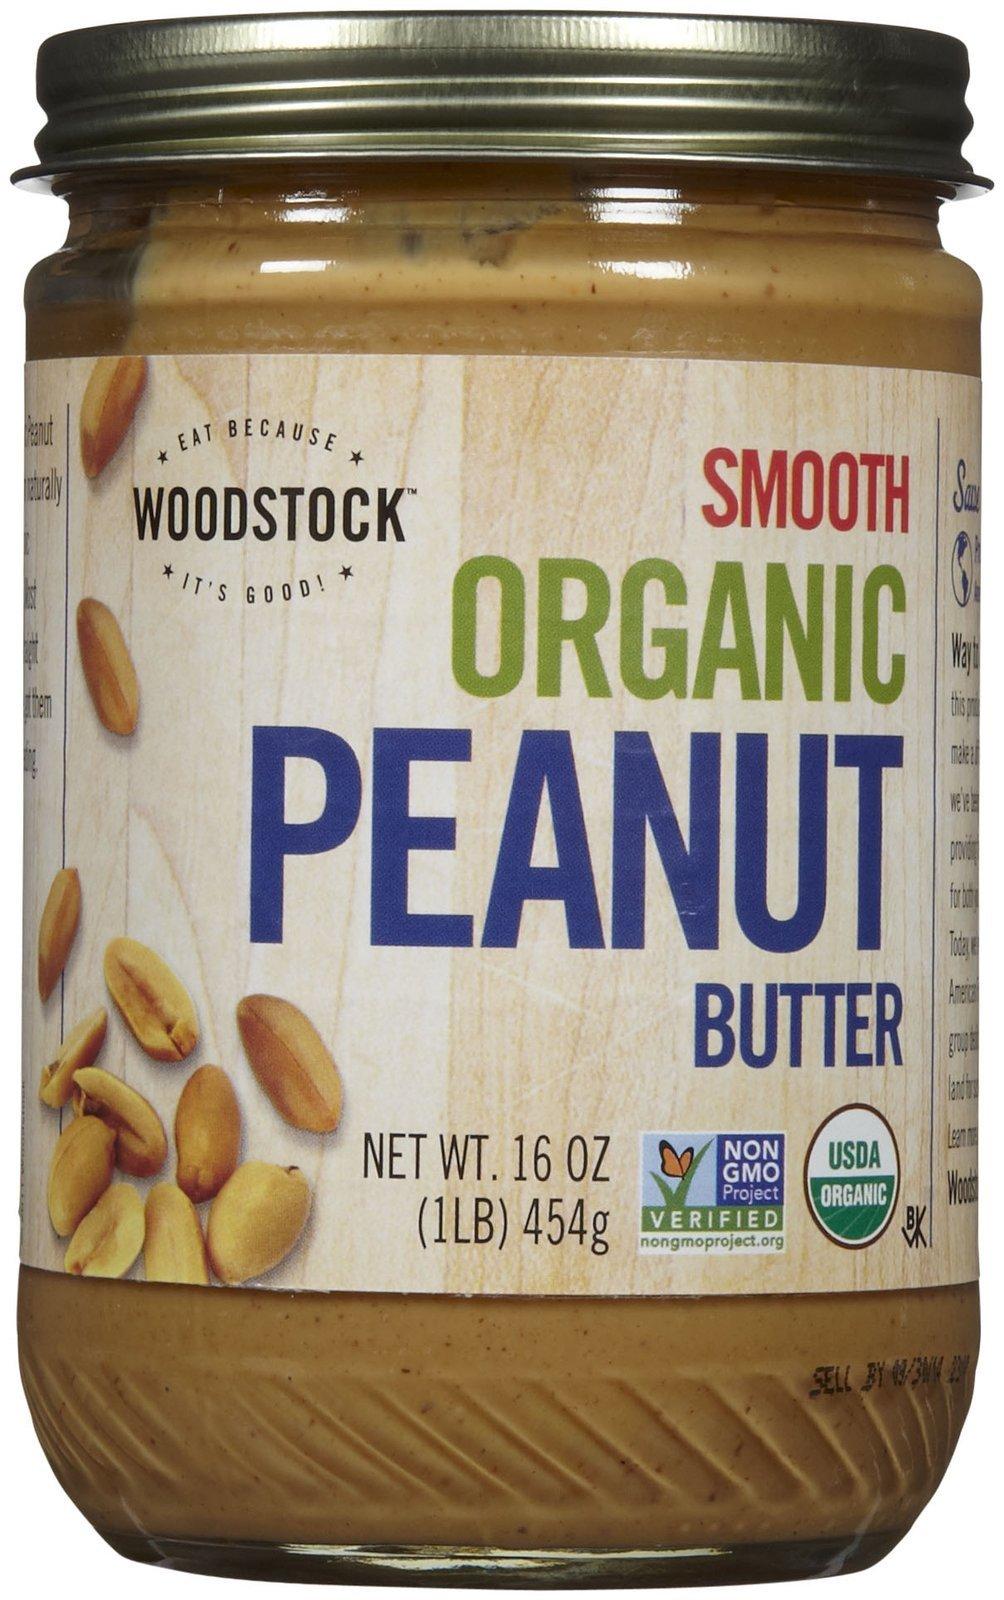 Woodstock Organic Smooth Peanut Butter, 16 oz